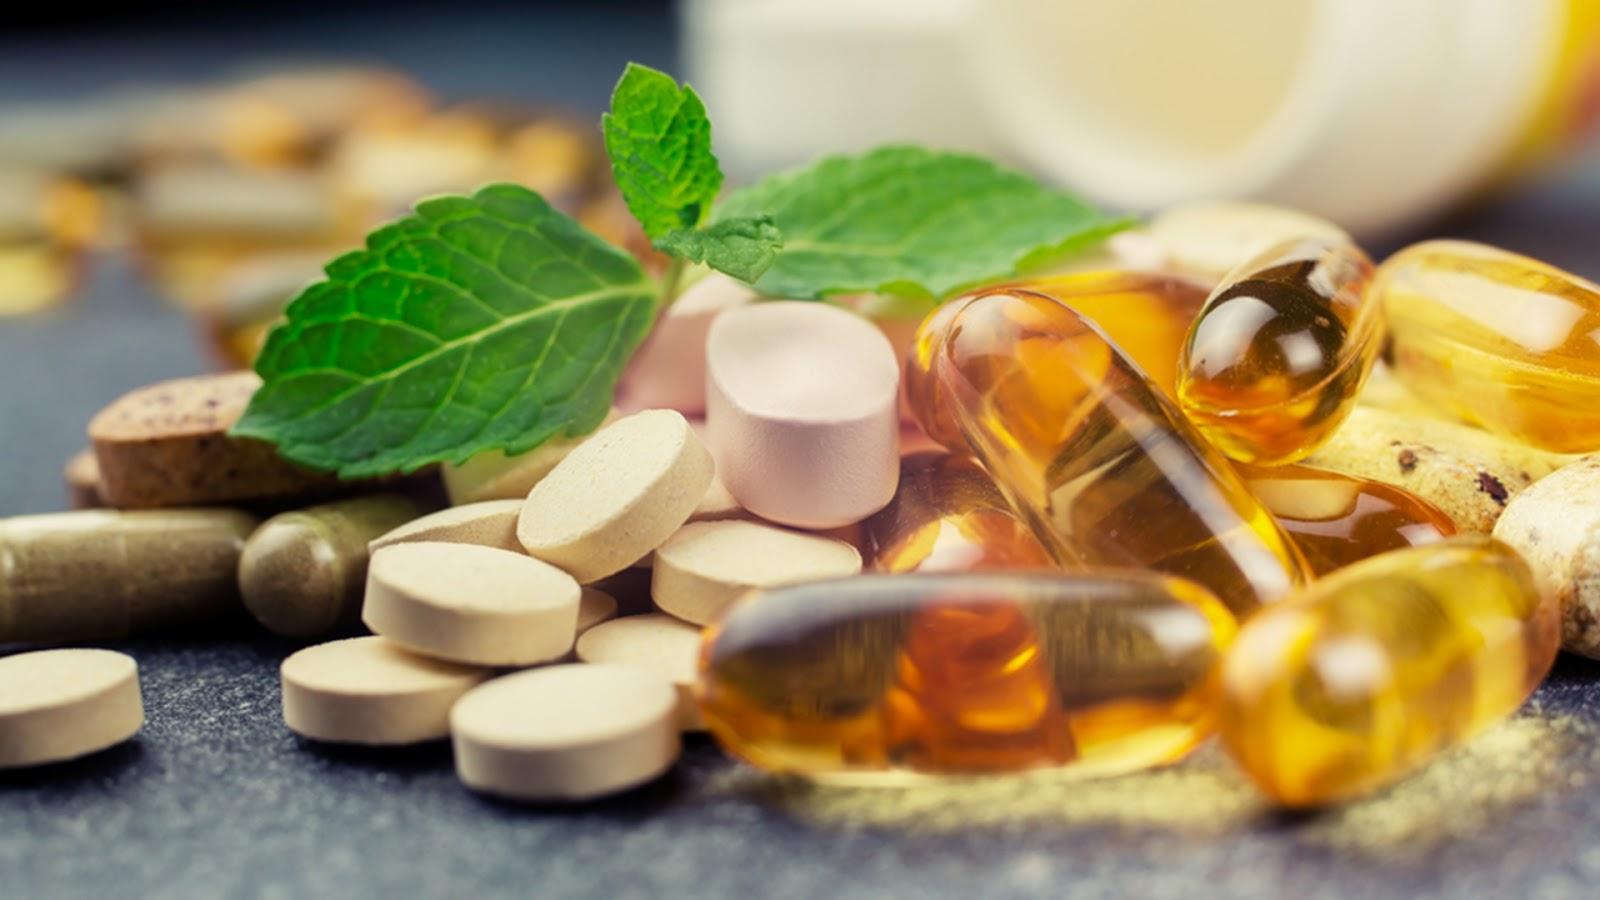 Inositol (vitamin Bh)